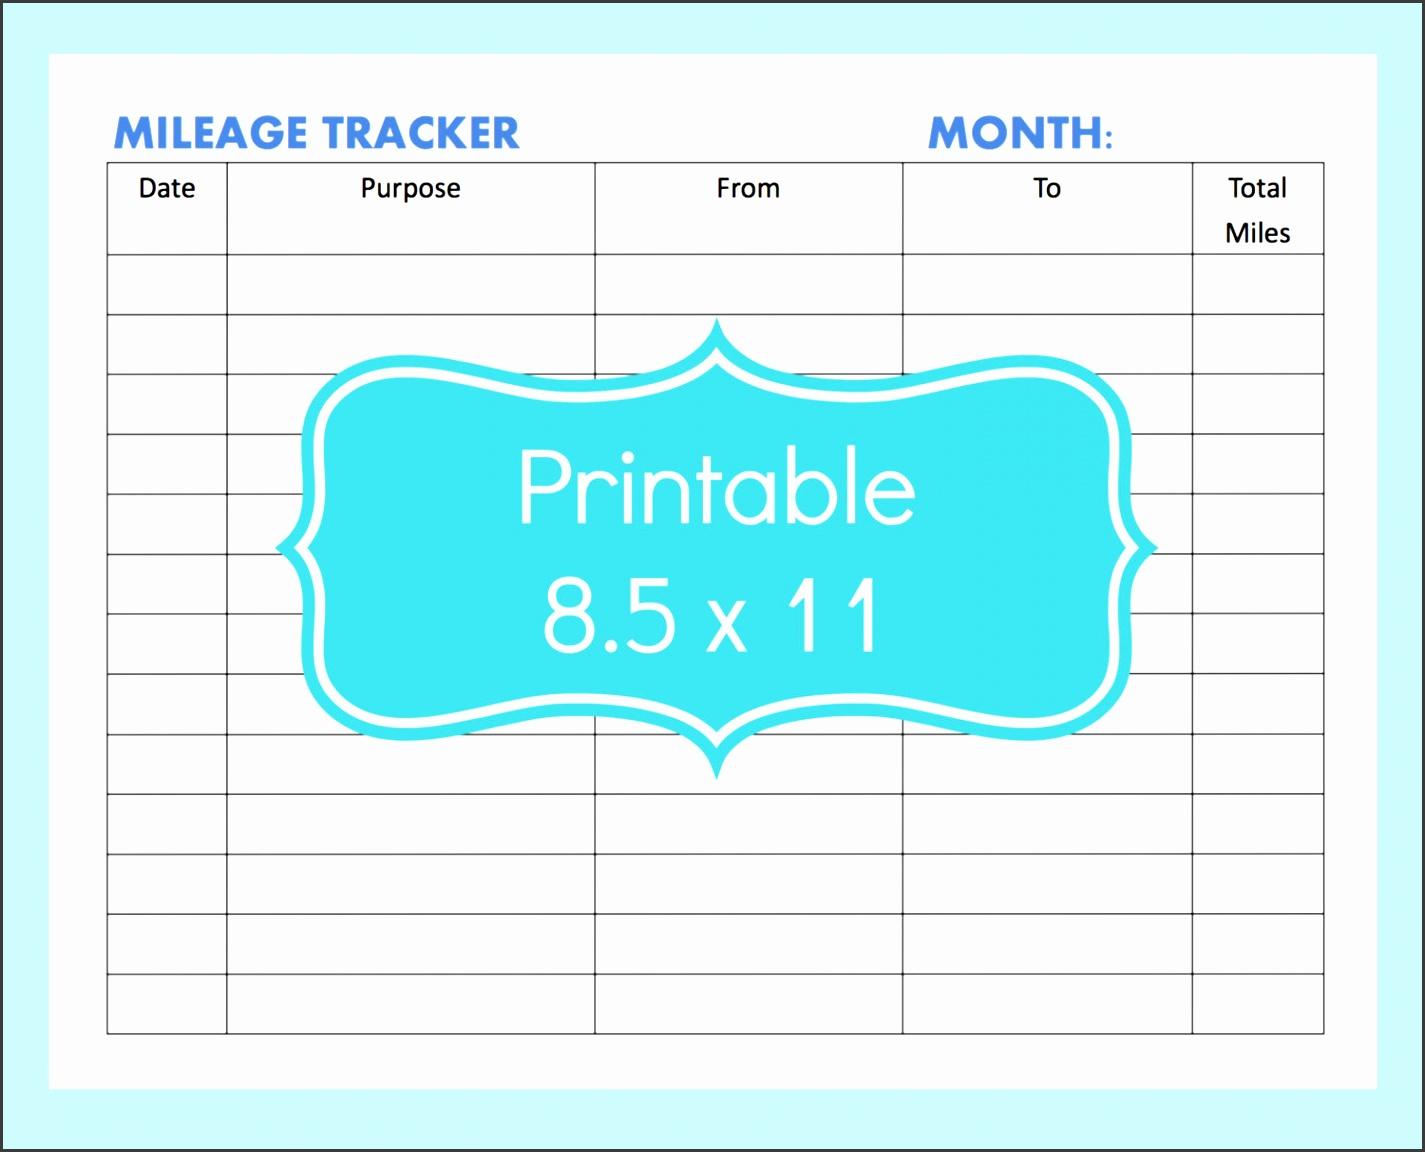 mileage tracker form printable printable mileage tracker mileage log template pdf 8 5 x 11 car mileage log maintenance log